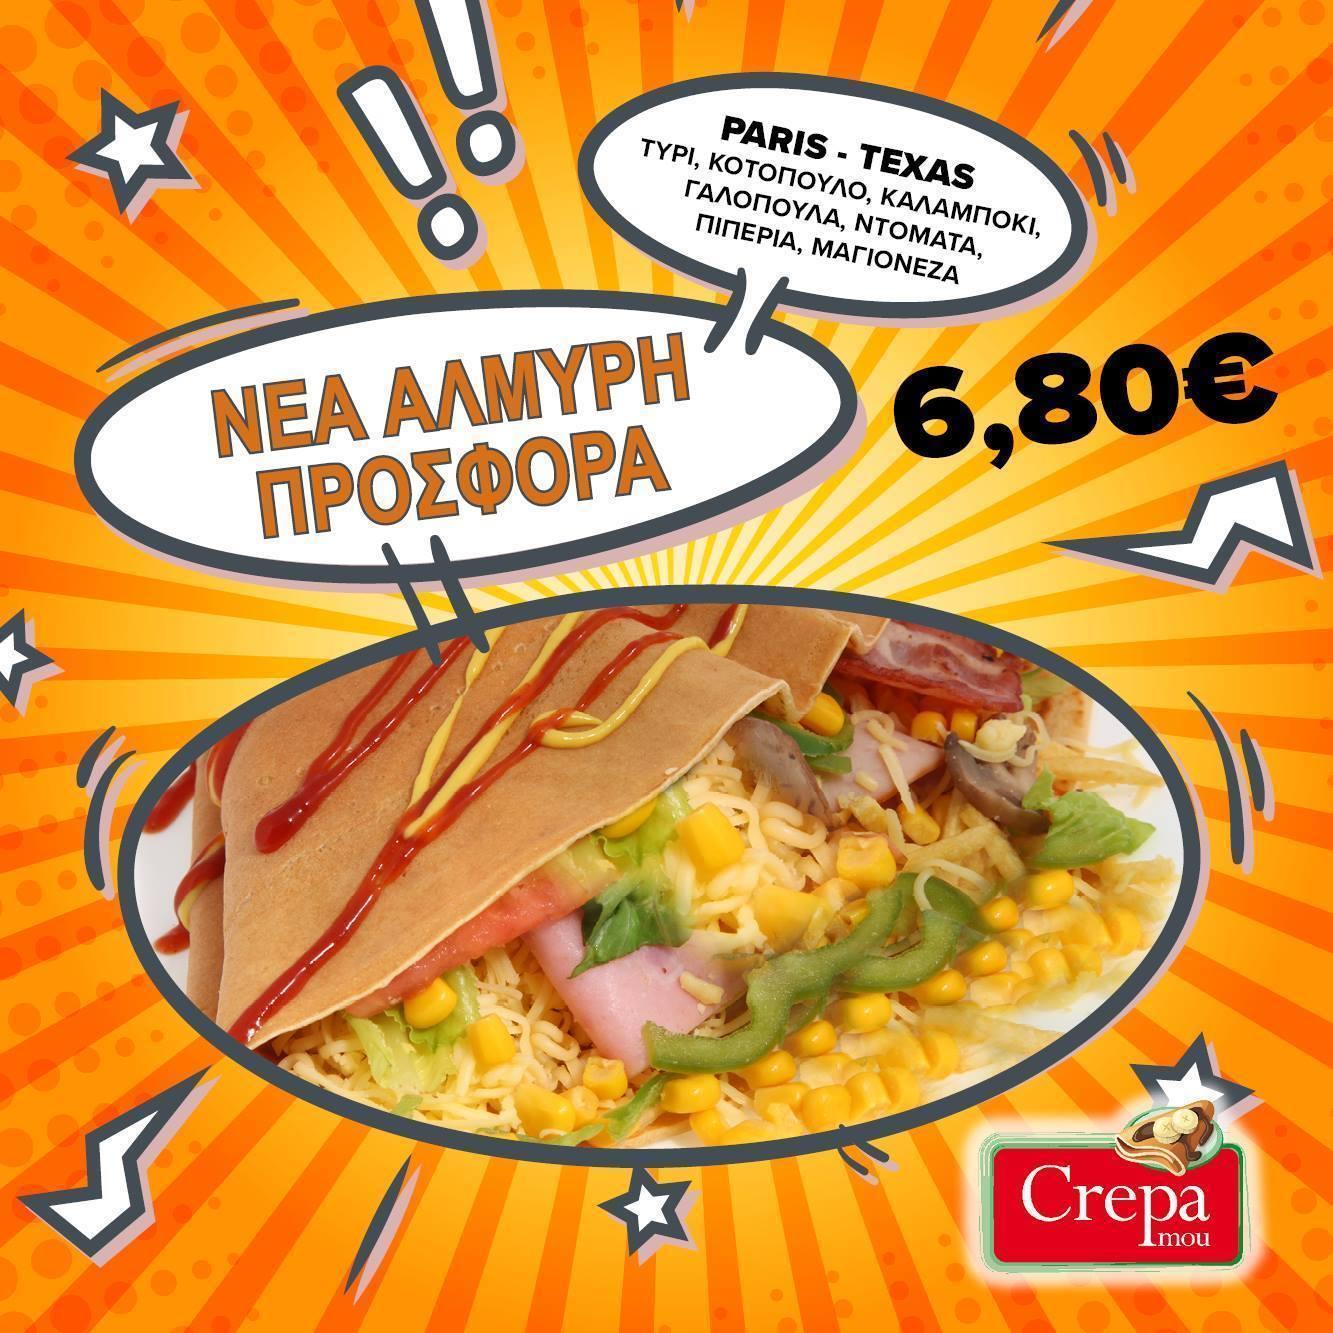 crepamou monday offer 270317